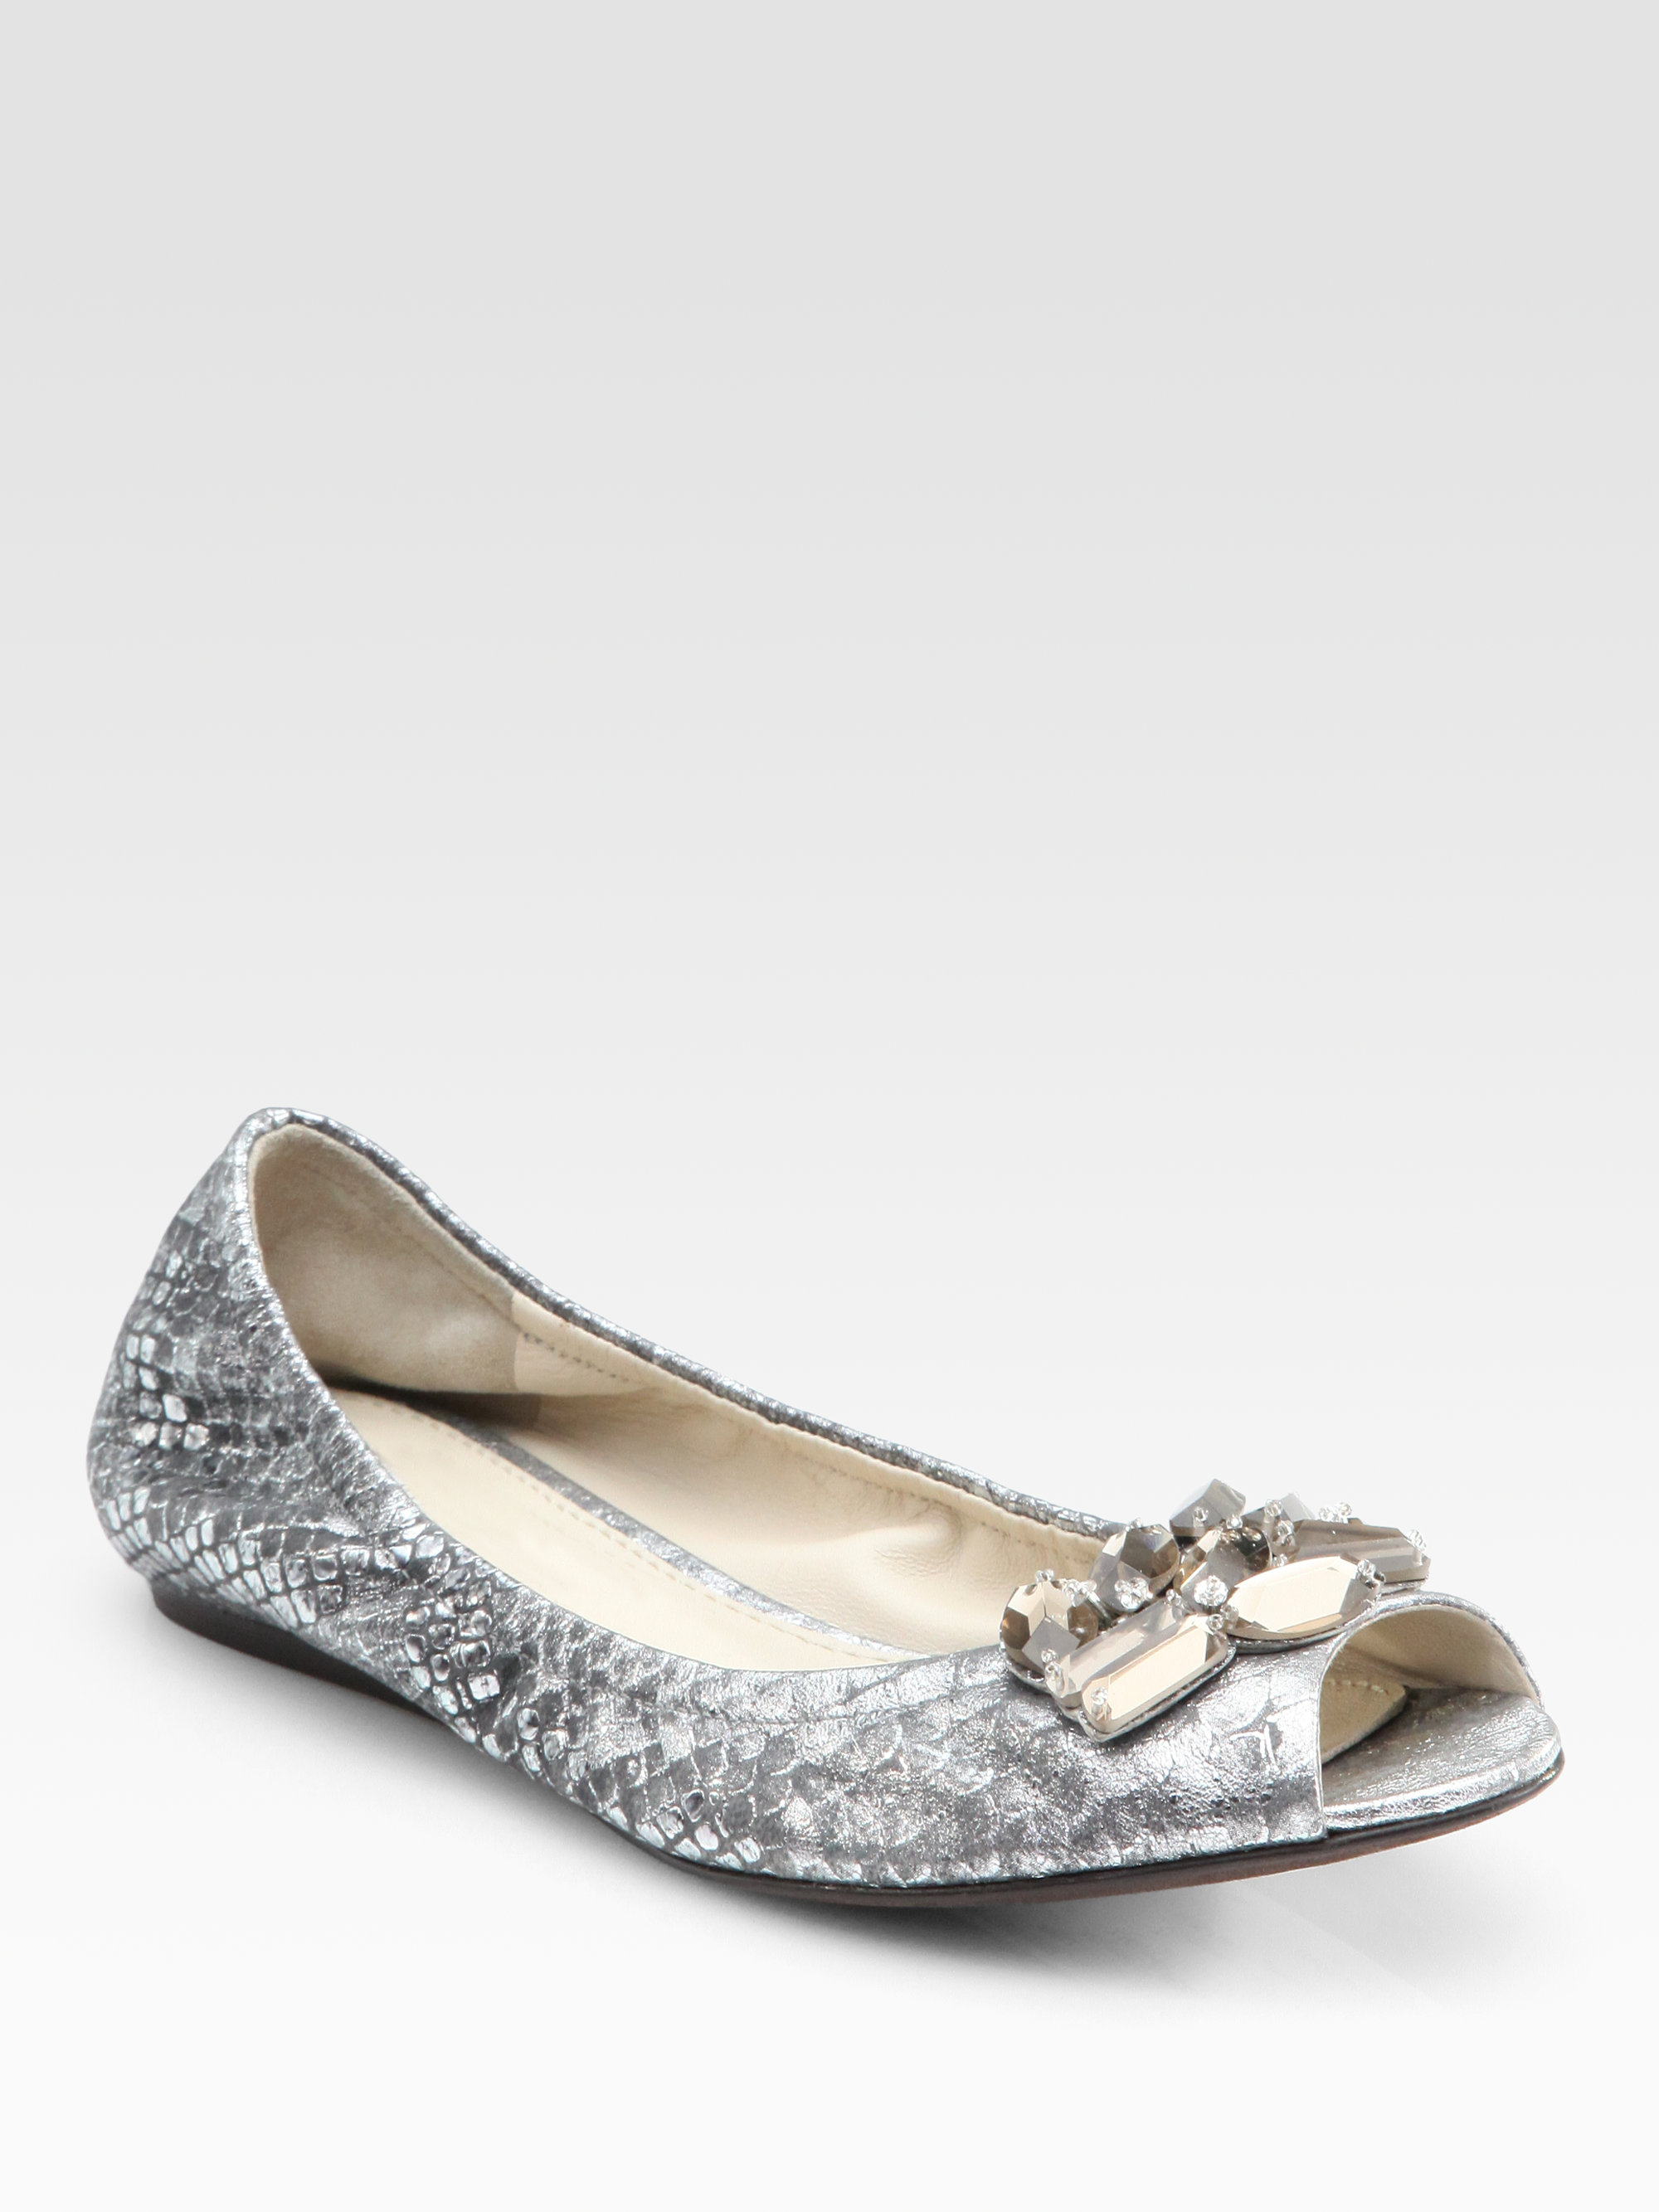 Vera Wang Wedding Shoes Ballet Flats